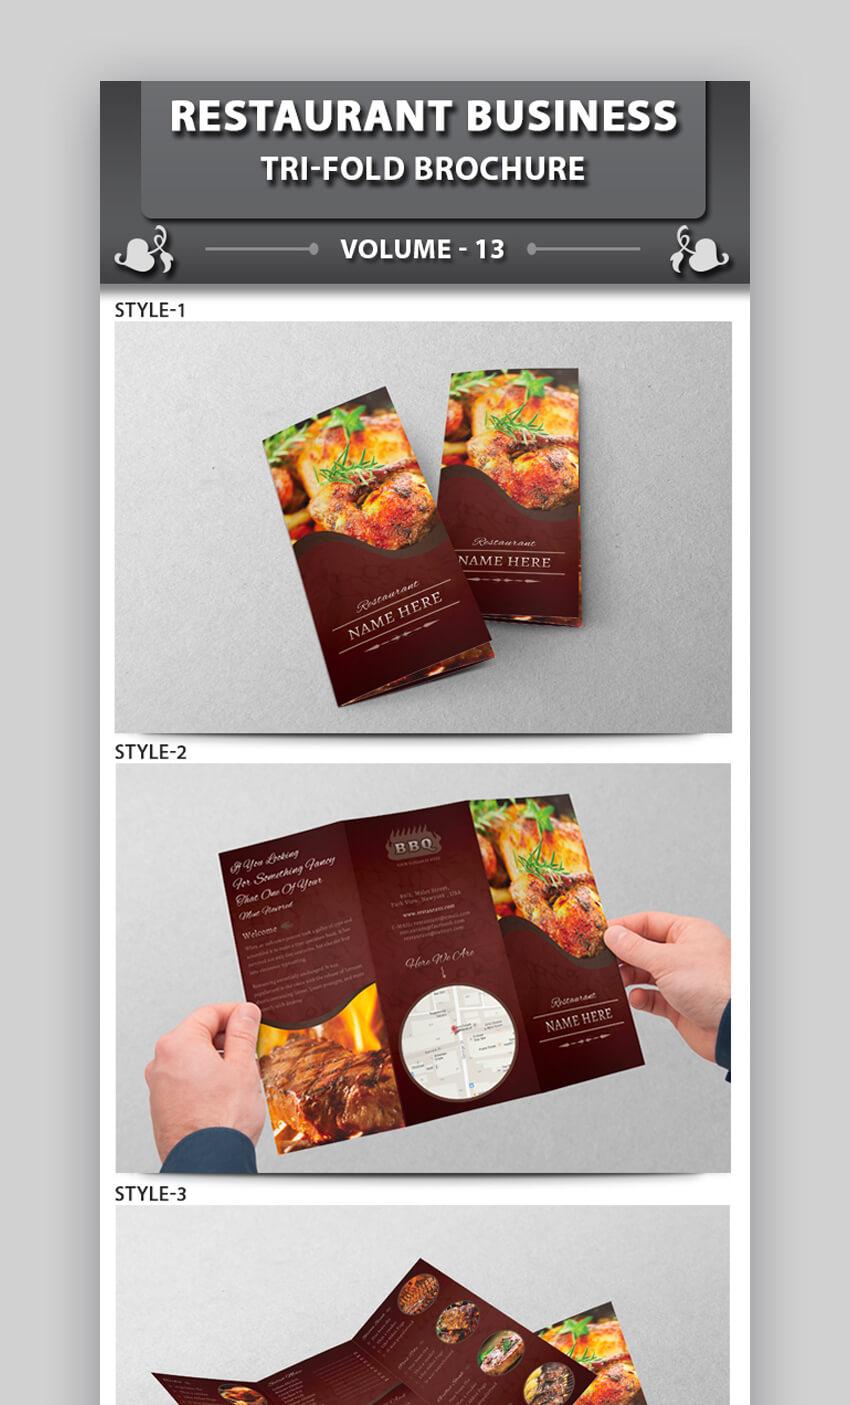 Restaurant Business Tri-fold Brochure